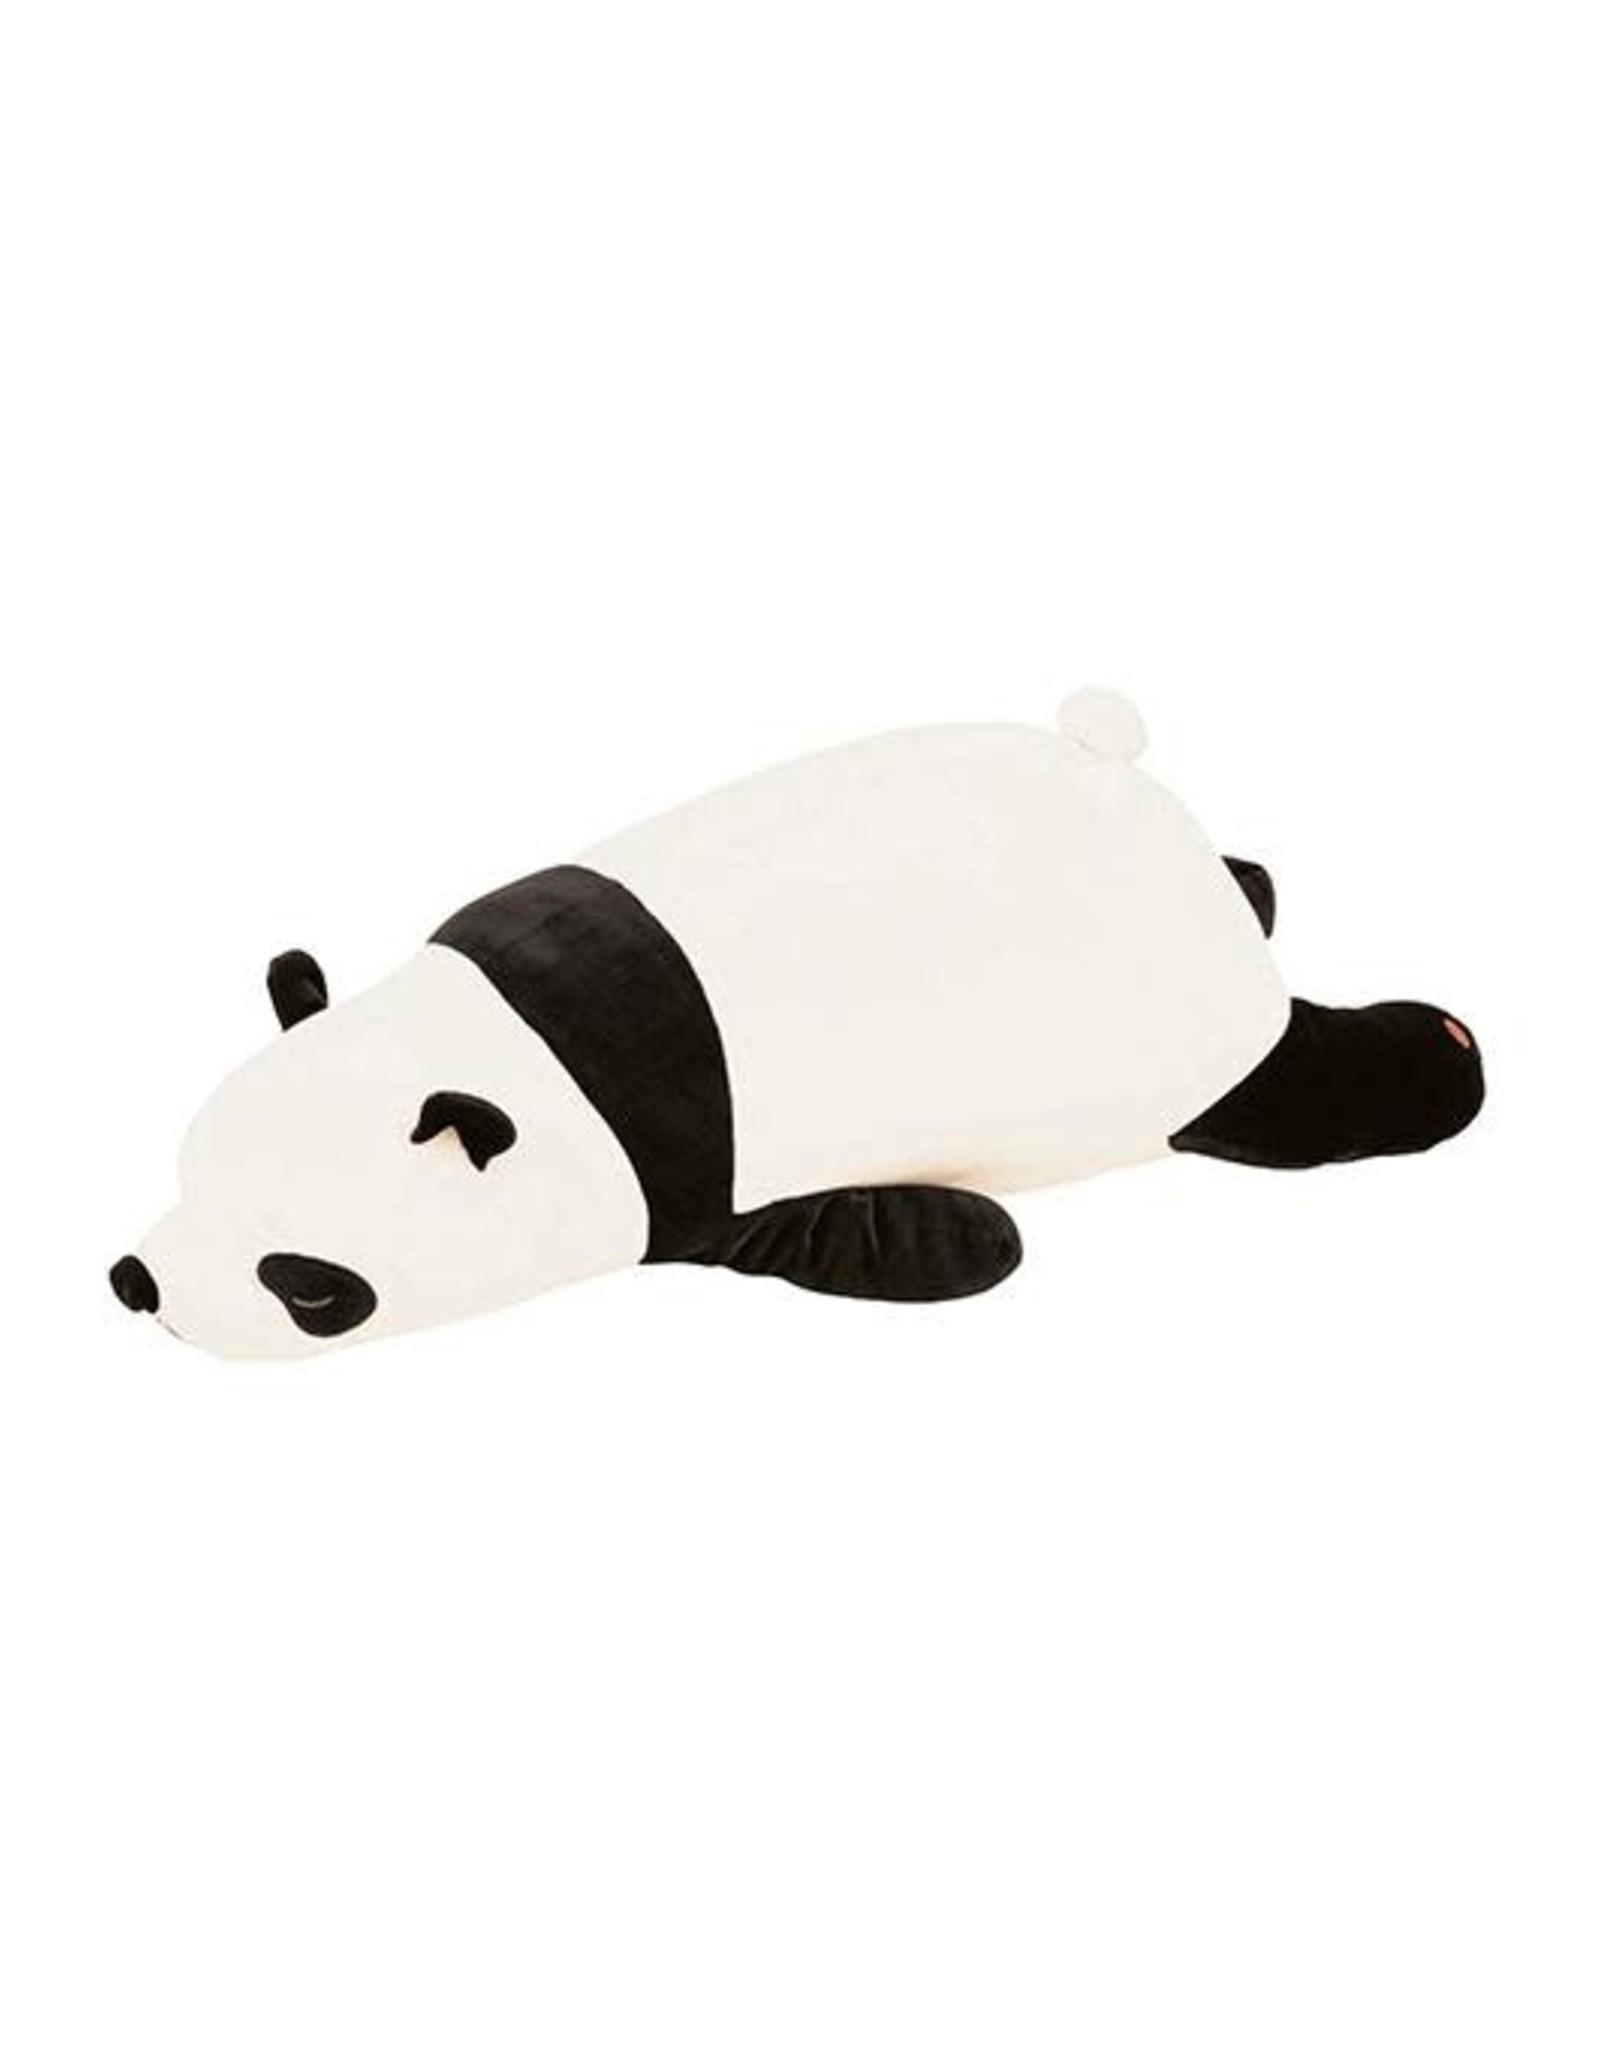 Nemu Nemu Paopao  -Le Panda - Large